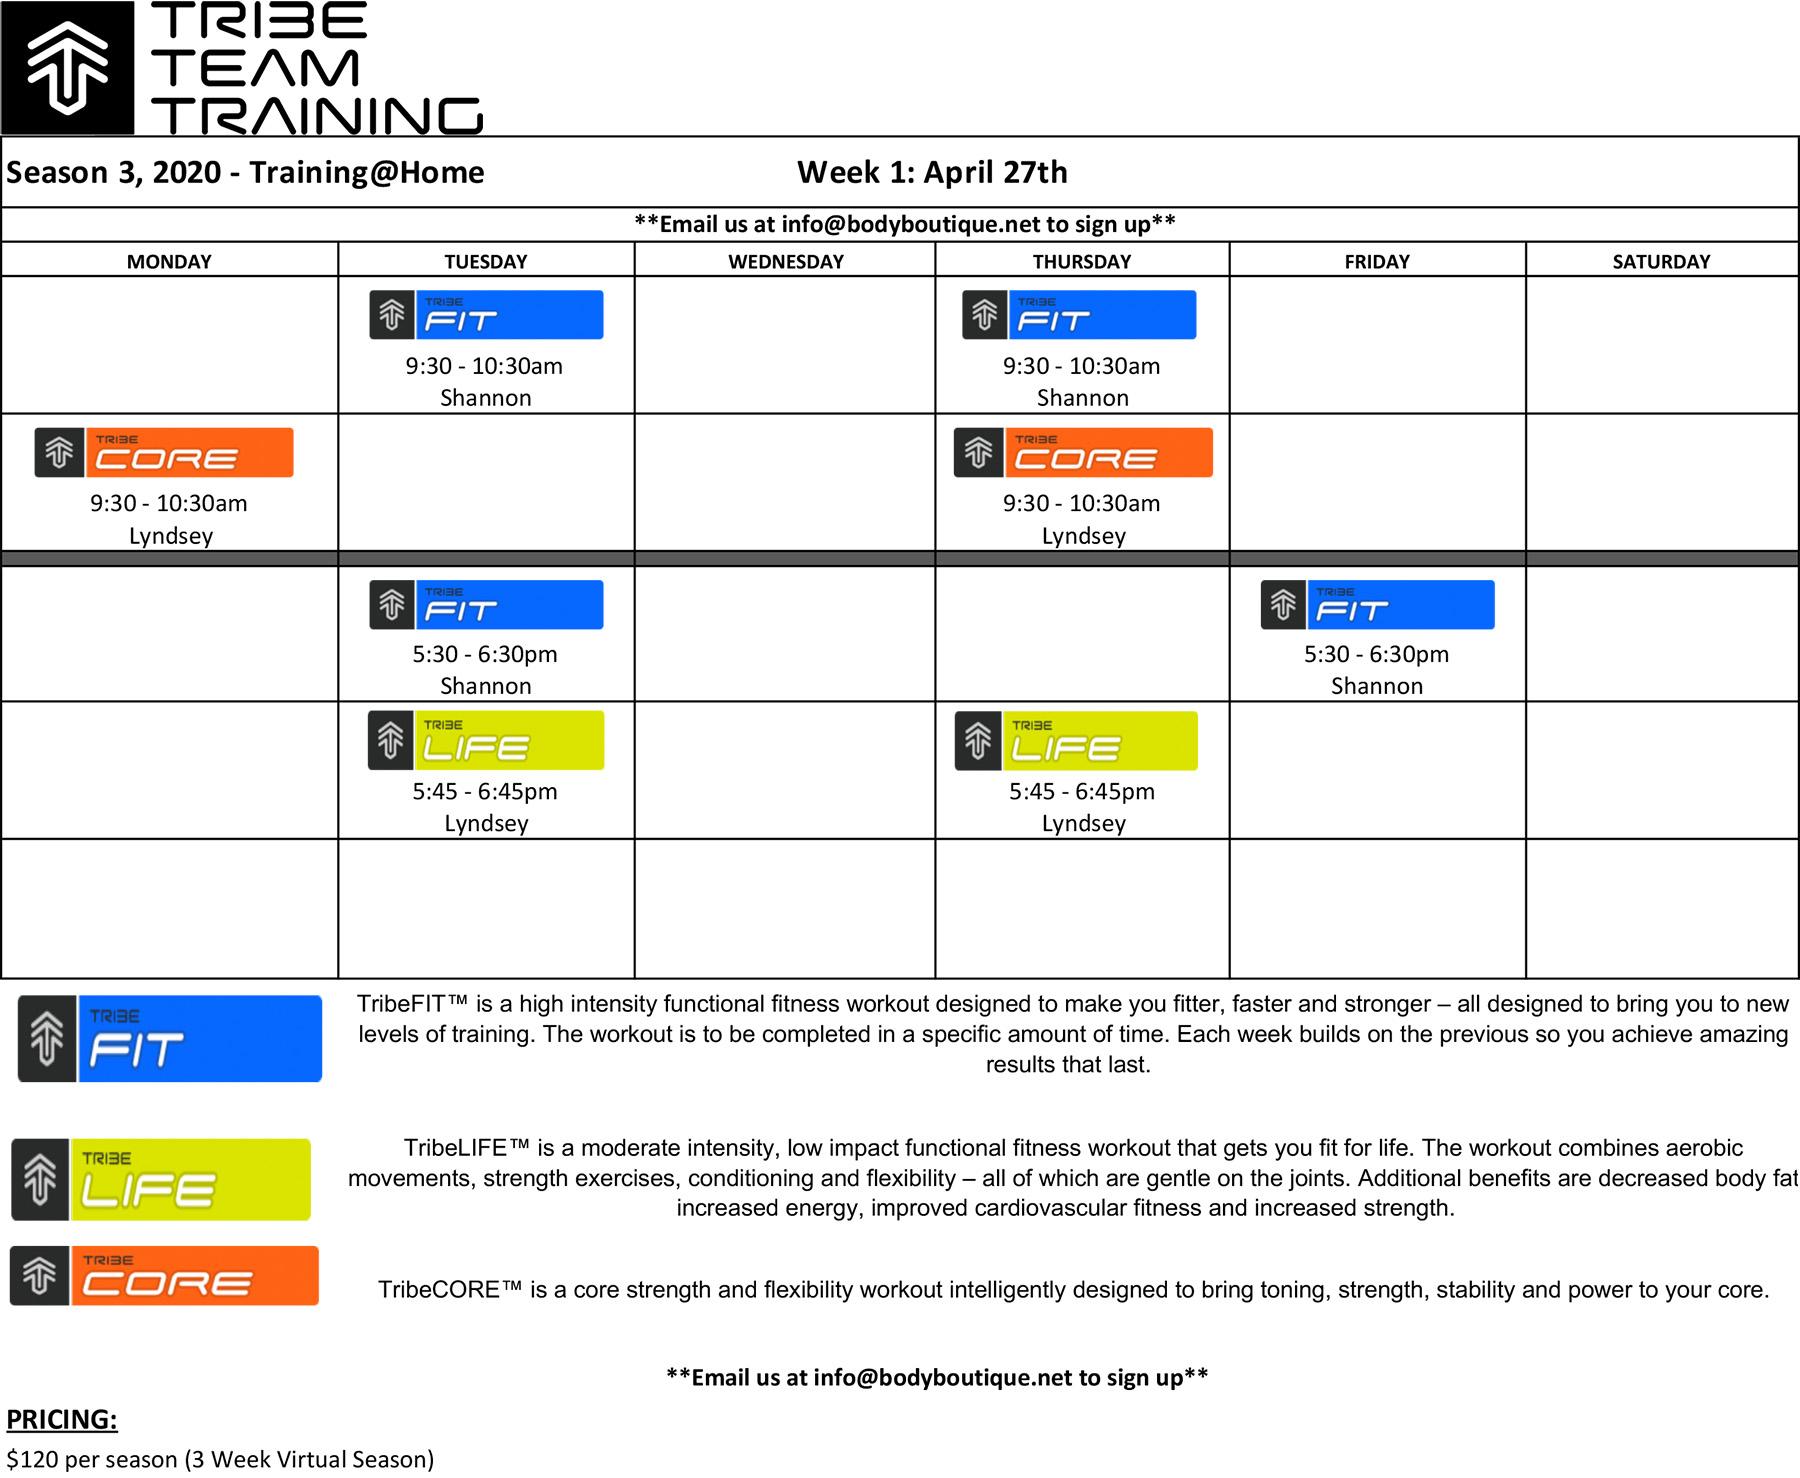 Tribe Team Training Class Schedule for Season Three 2020 - Training@Home